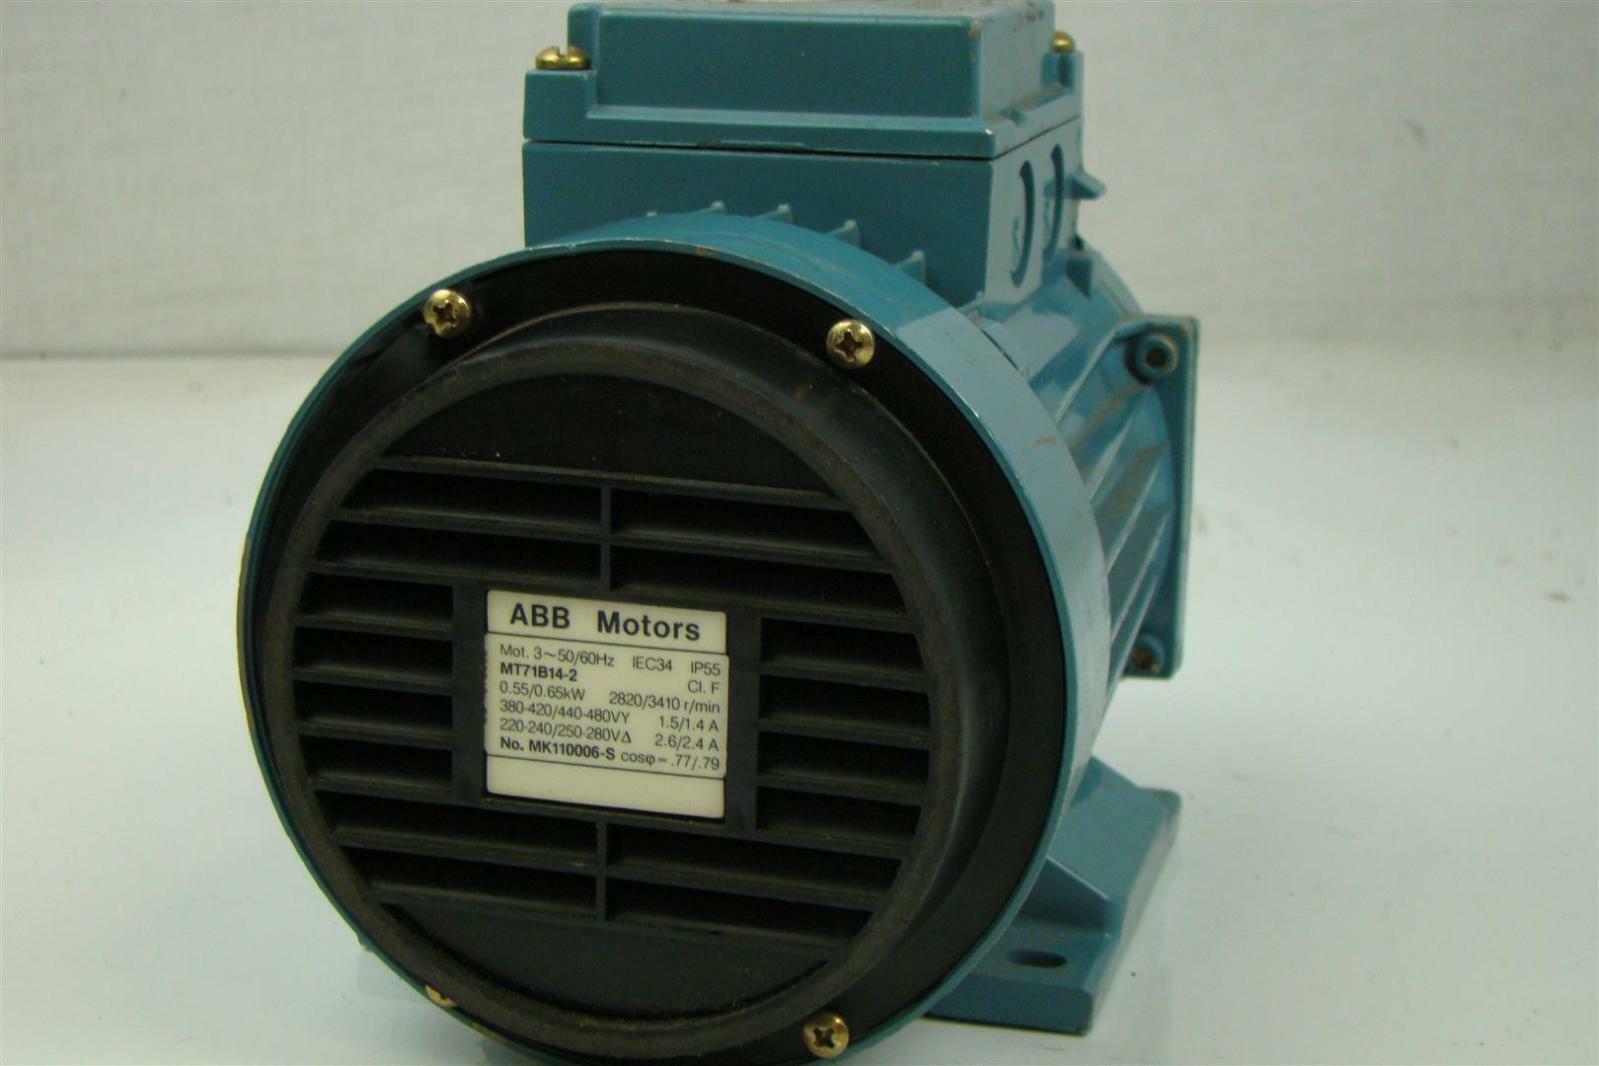 Abb electric motor 380 440v 60hz 65kw 1hp ebay for Abc electric motor repair